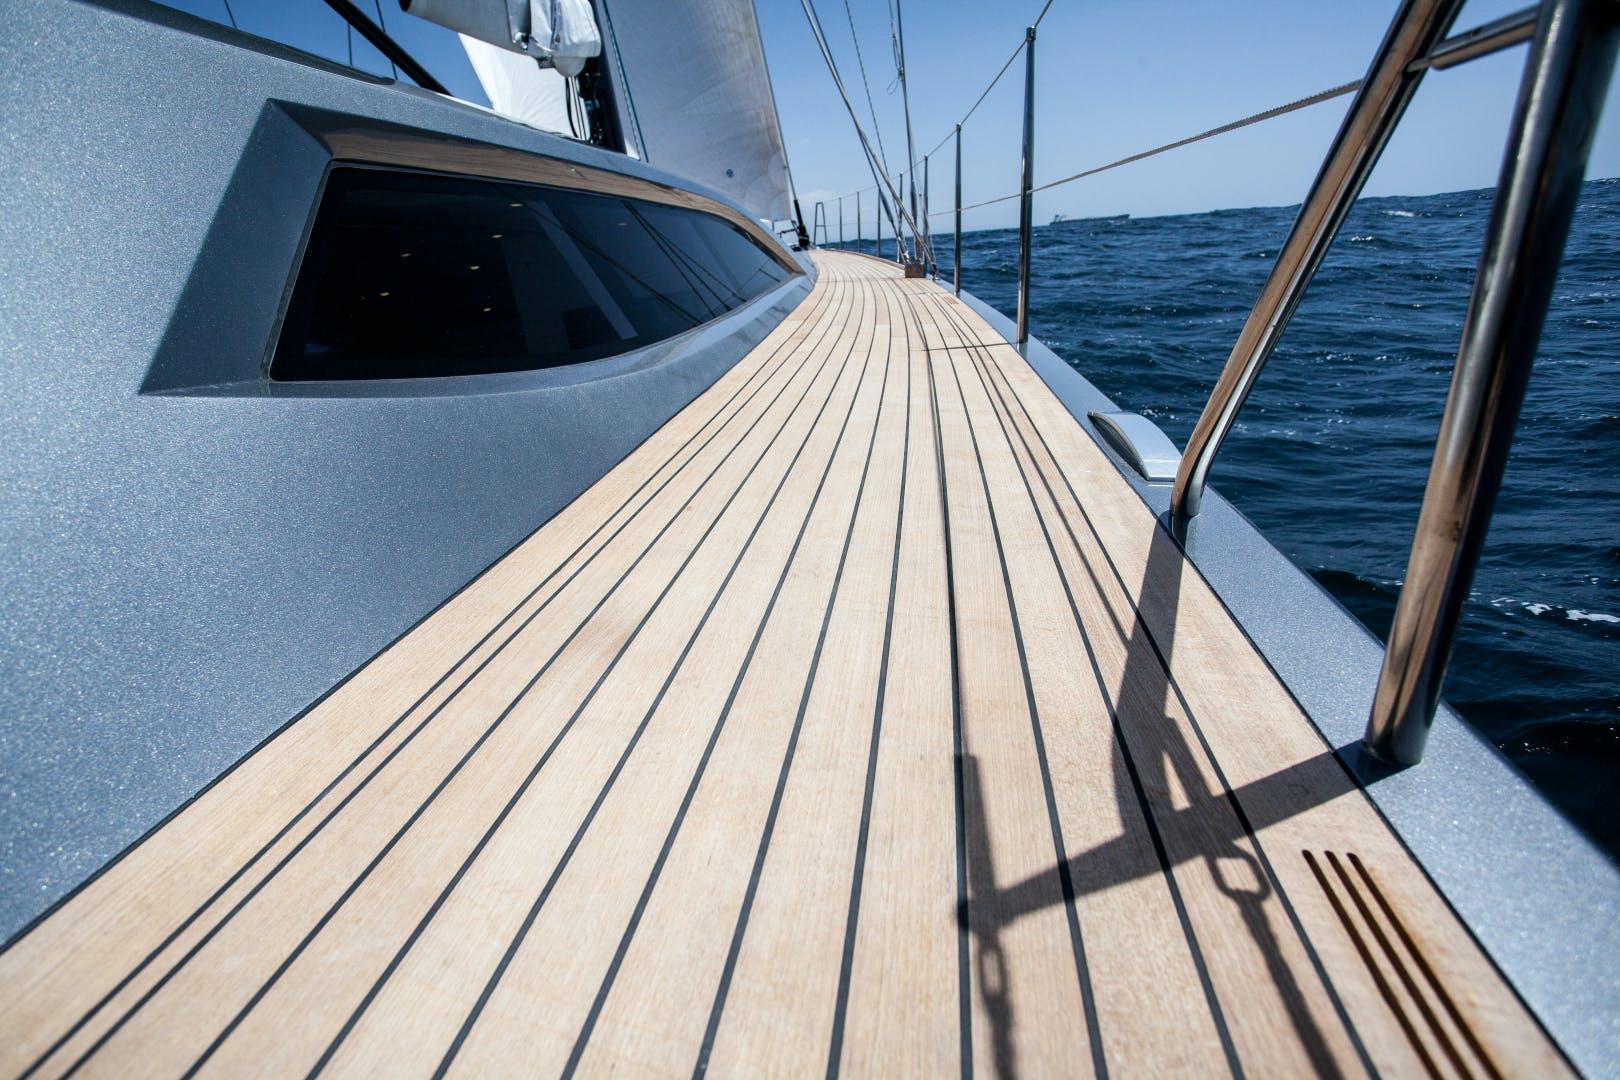 1996 Goetz / Derecktor 77' Custom Sparkman & Stephens Designed Performance Sailing Yacht AANDEEL | Picture 1 of 24